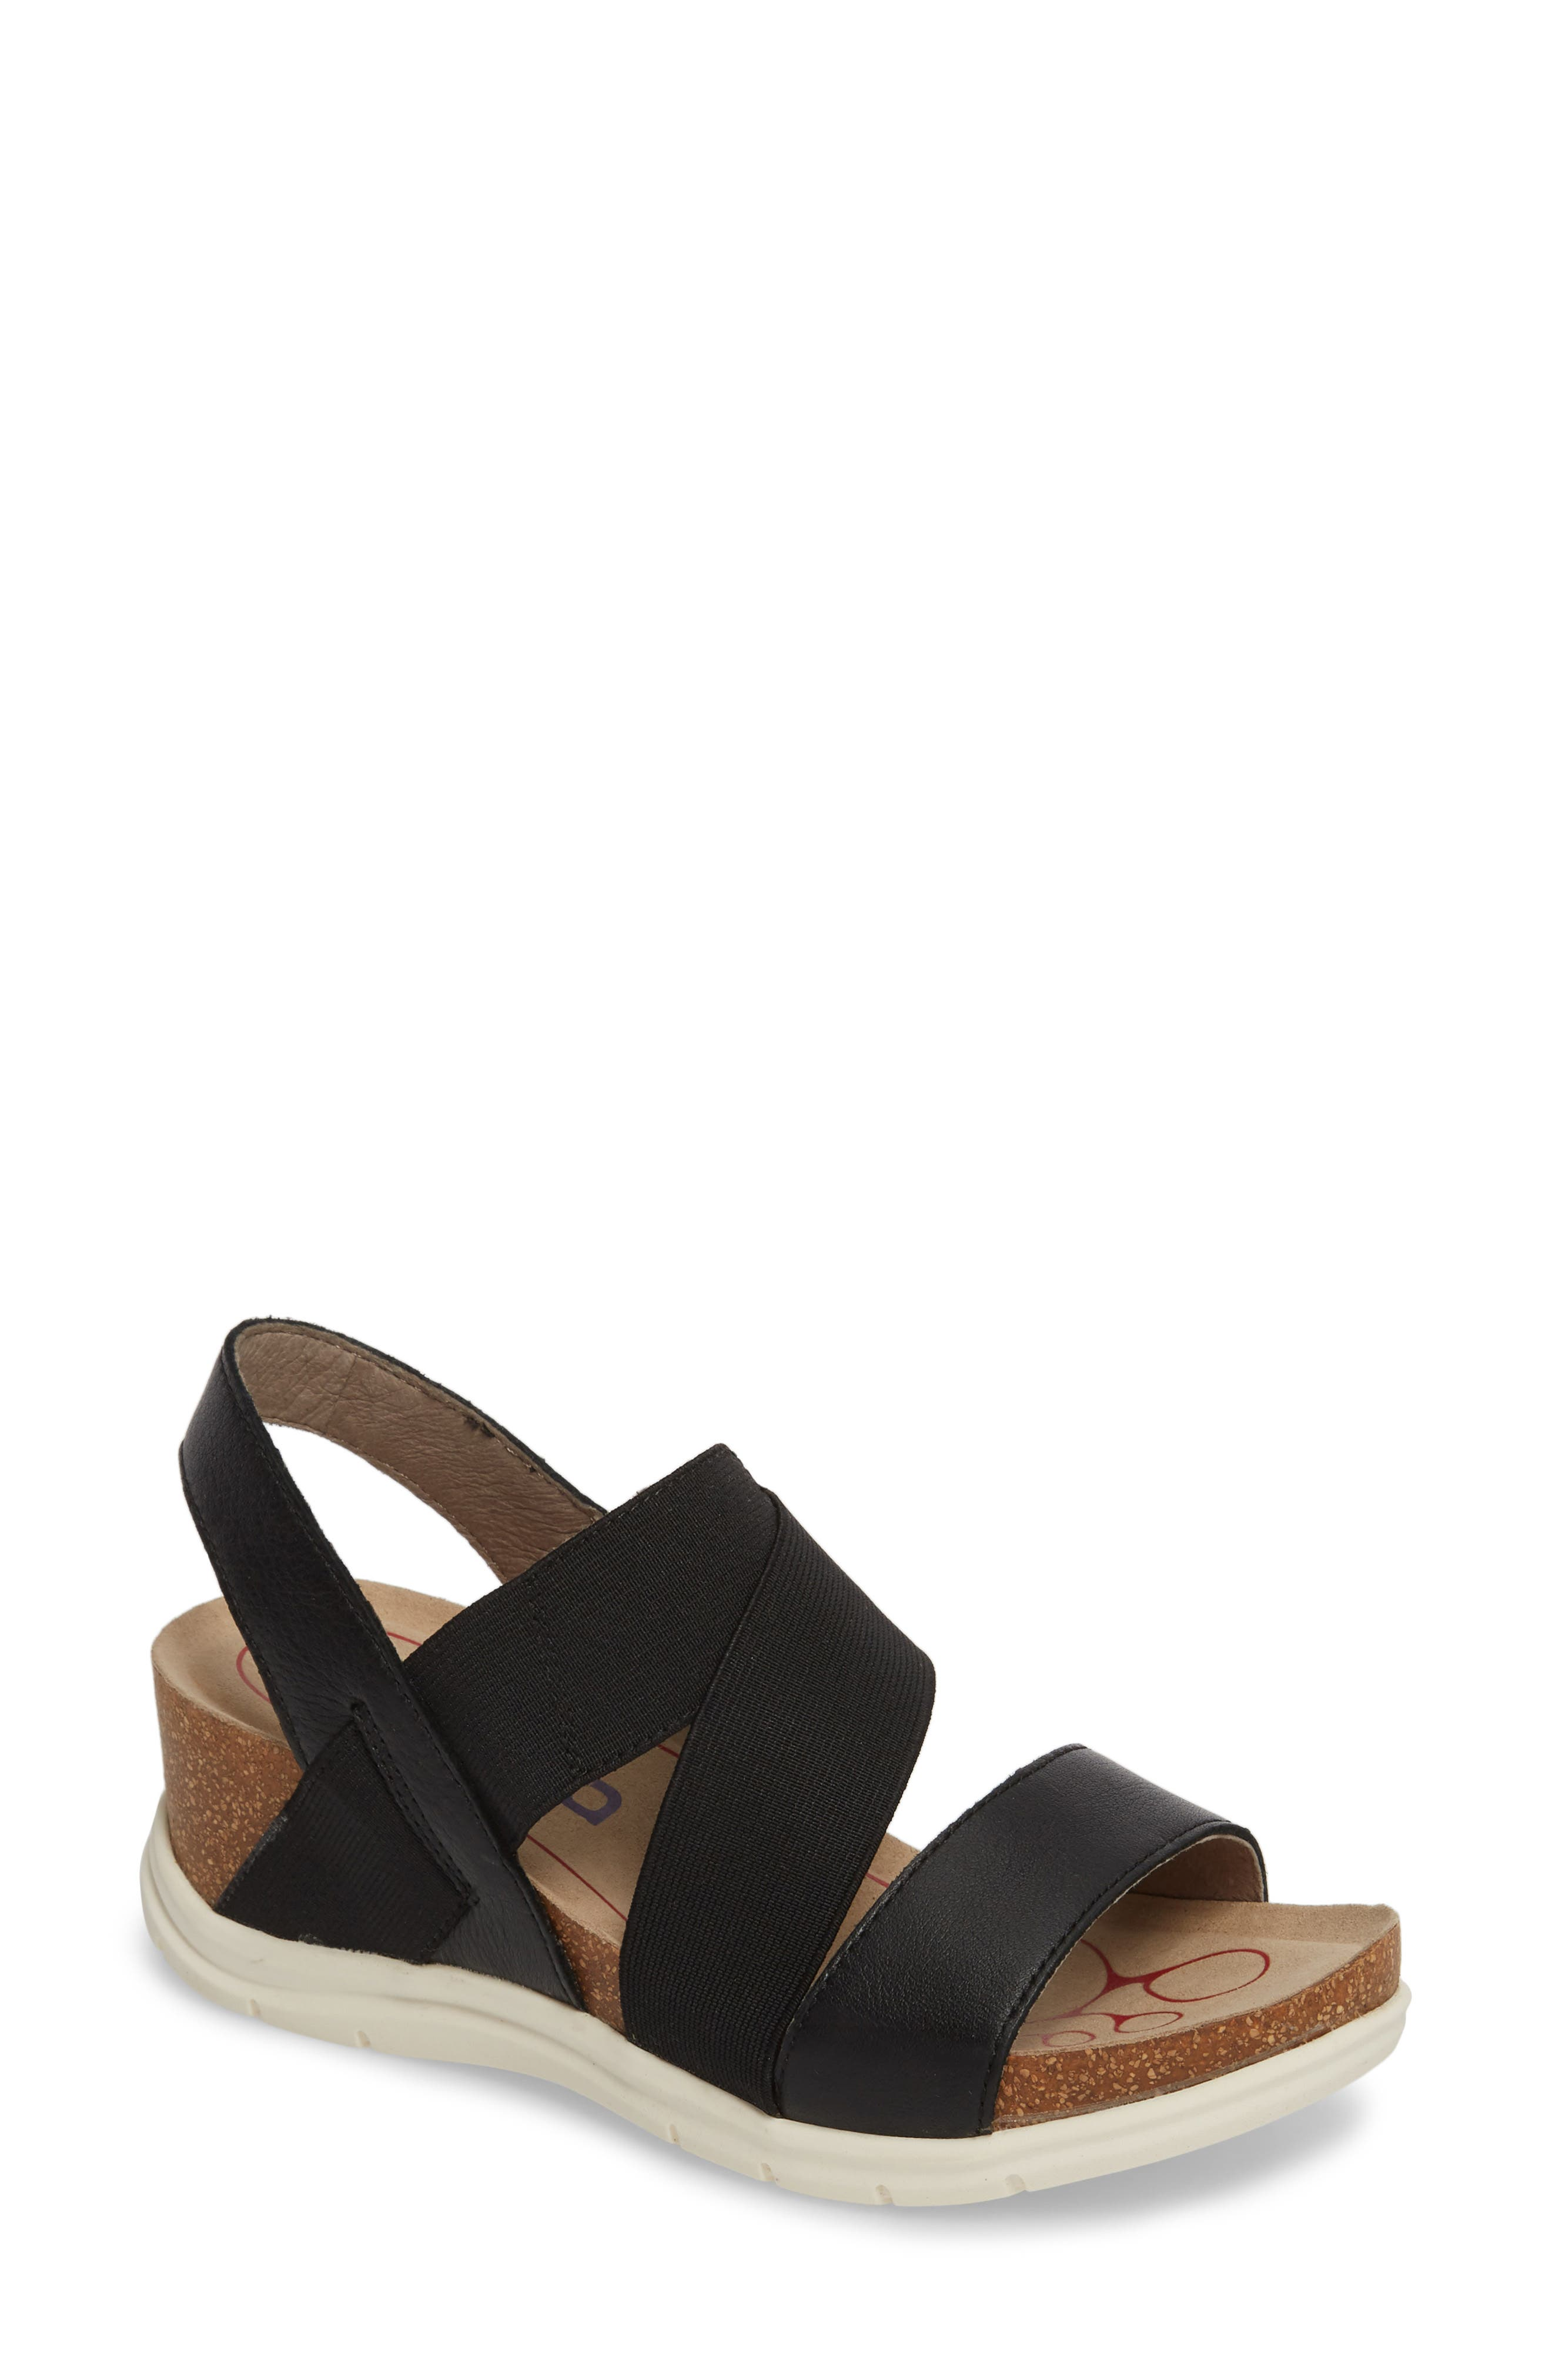 Paisley Wedge Sandal,                         Main,                         color,